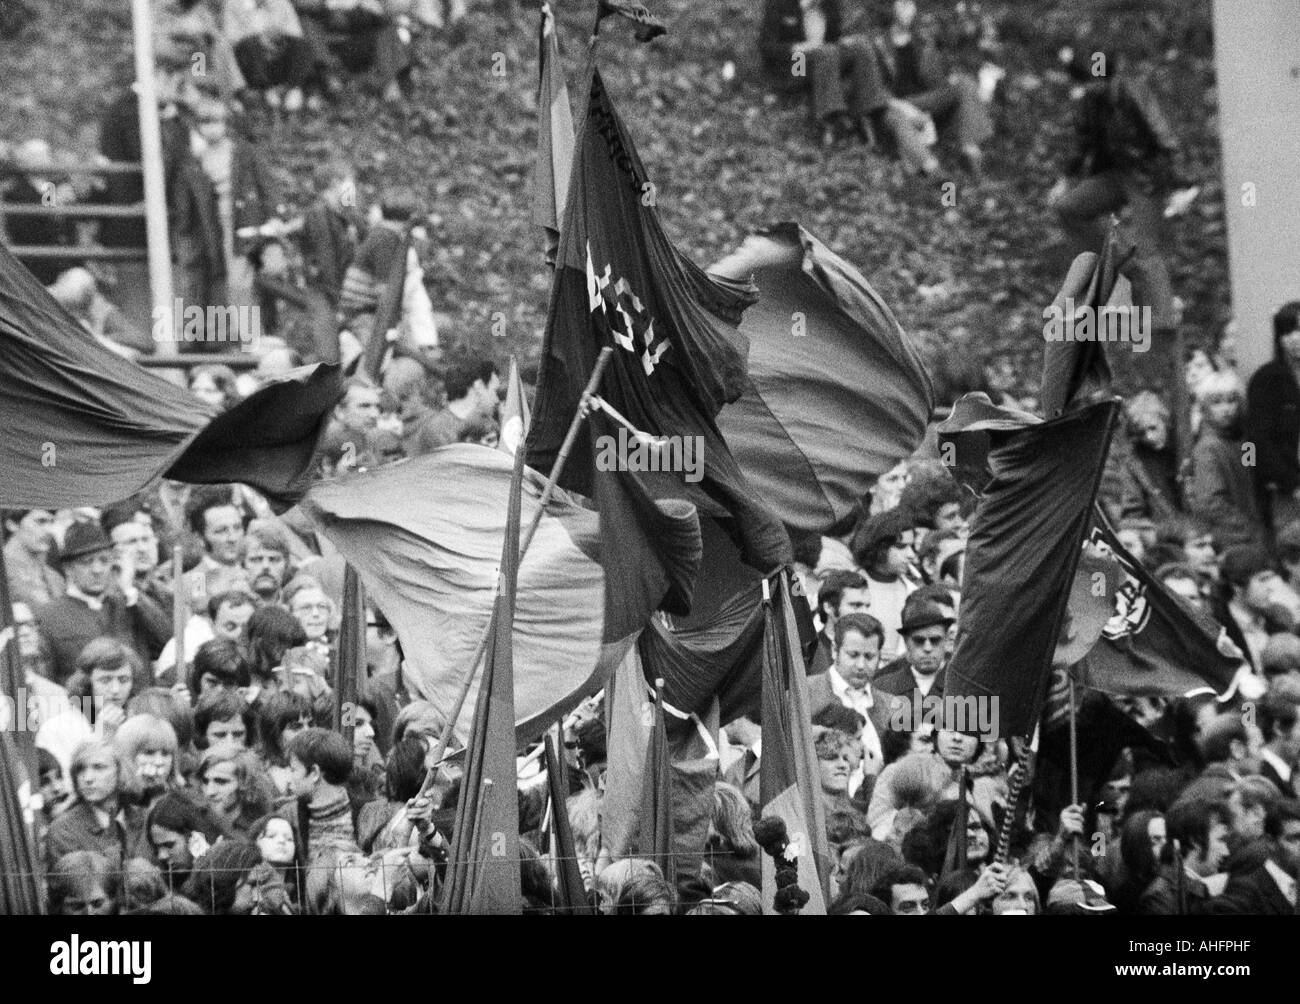 football, Bundesliga, 1972/1973, Wuppertaler SV versus Hertha BSC Berlin 4:1, Stadium am Zoo in Wuppertal, crowd of spectators, Wuppertal football fans wave their club flags - Stock Image